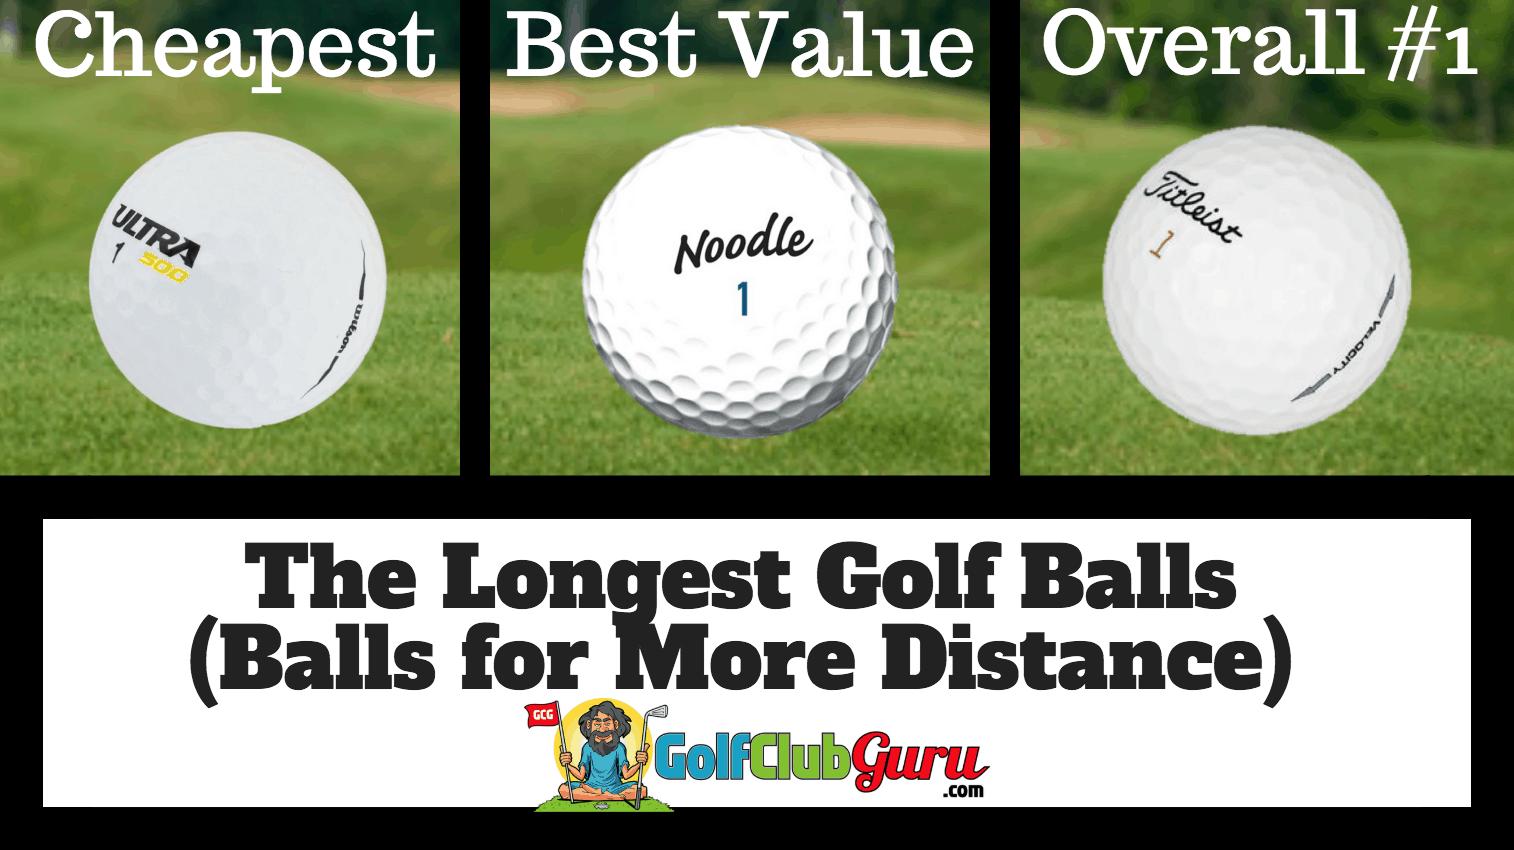 The Longest Golf Balls Best For Distance Golf Club Guru